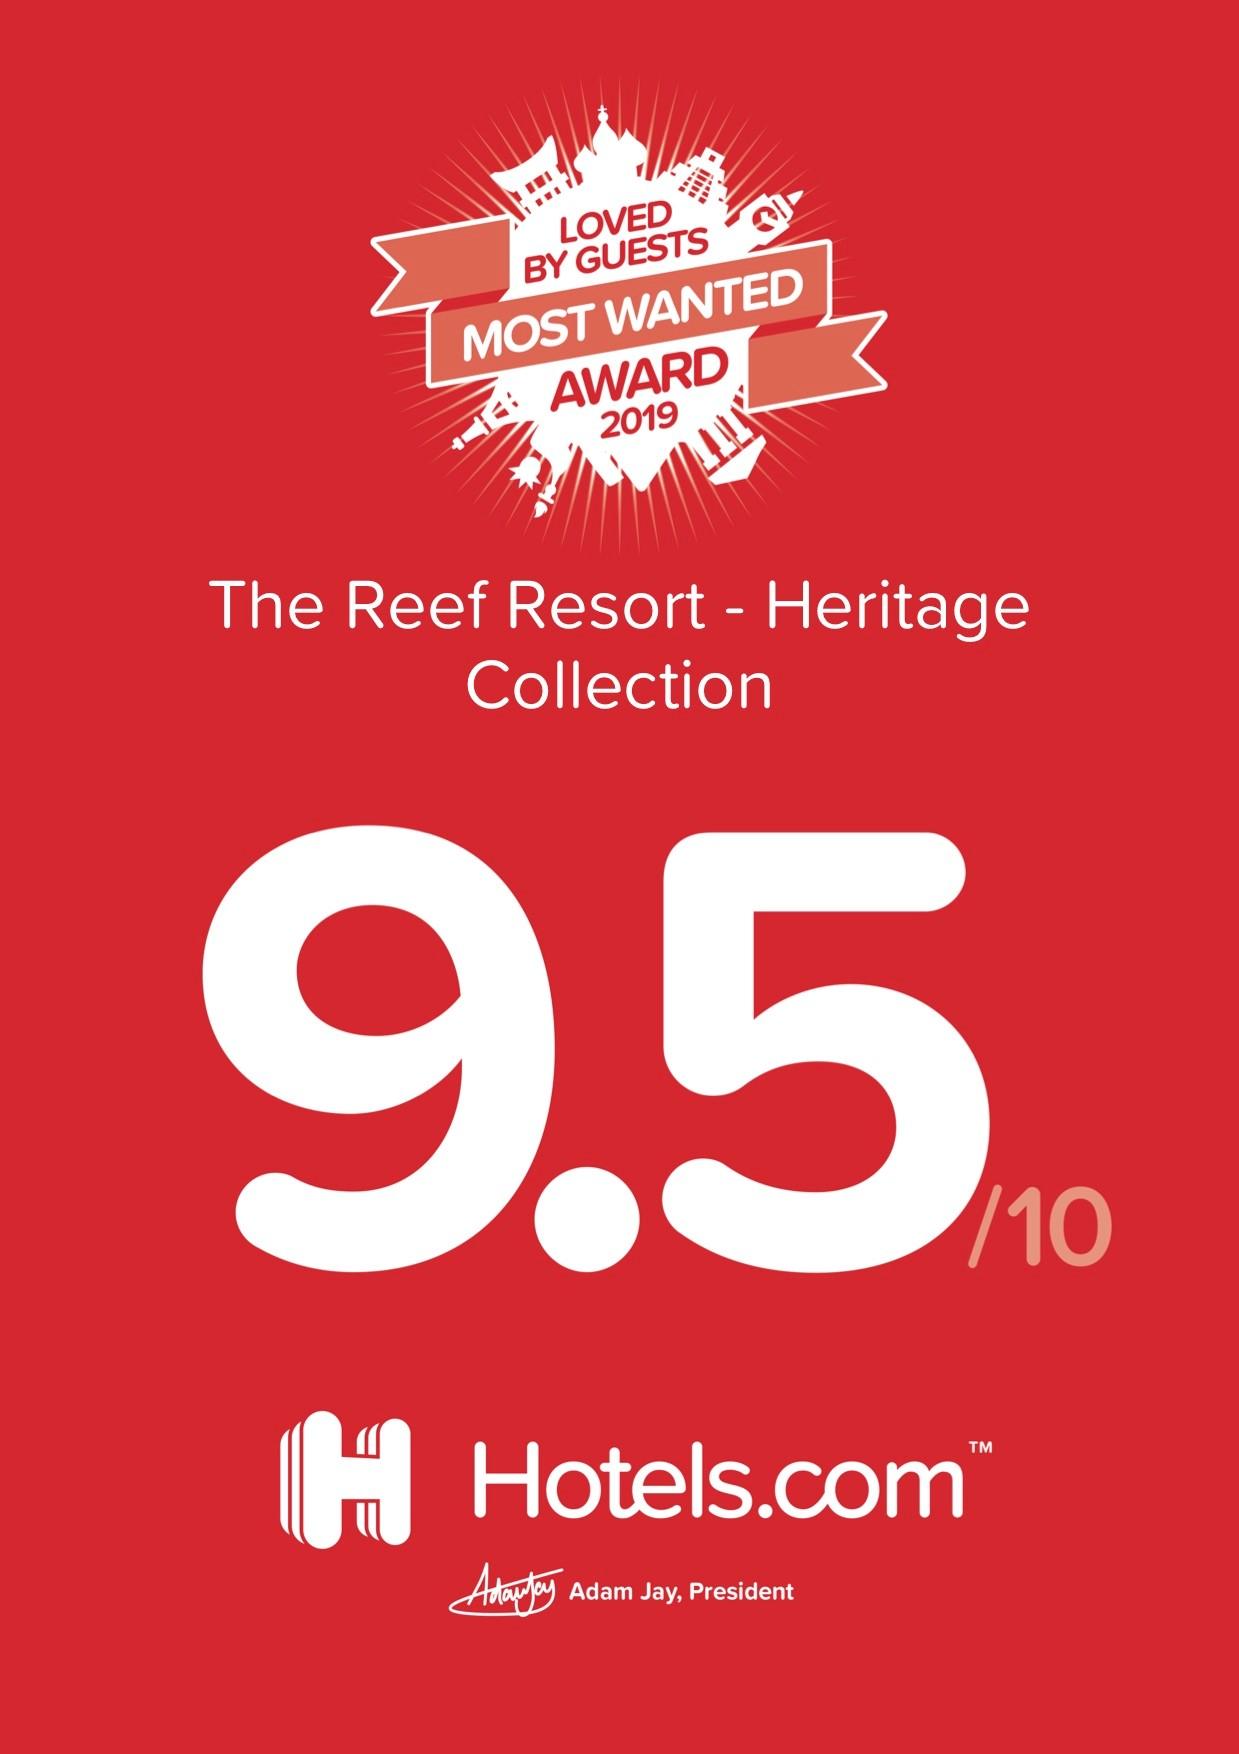 hotels.com most wanted award 2019